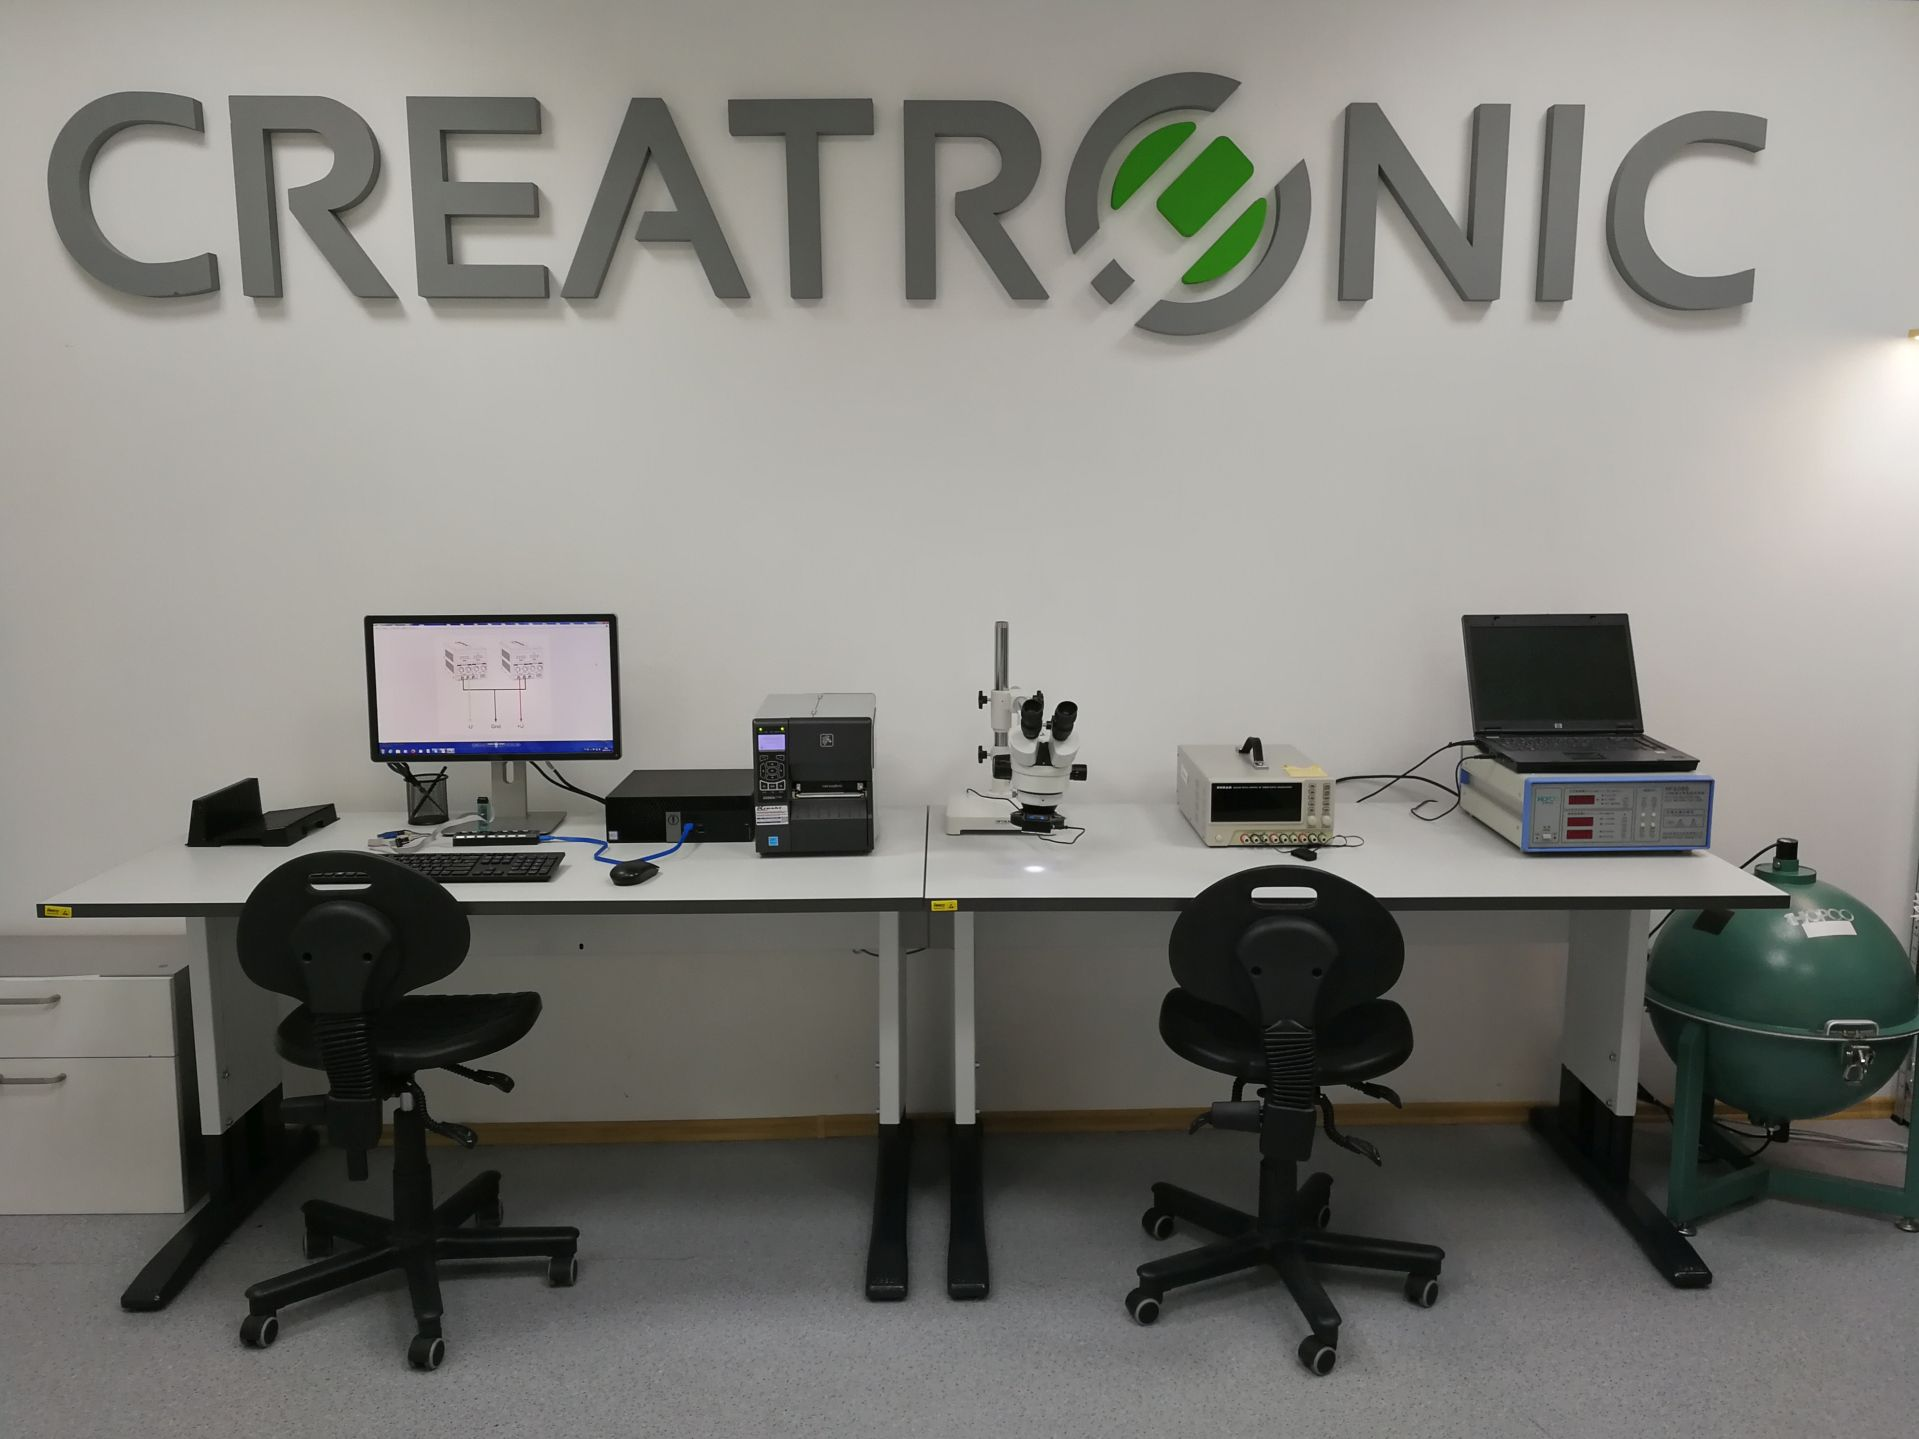 Creatronic - producent elektroniki, taśm LED, modułów LED.